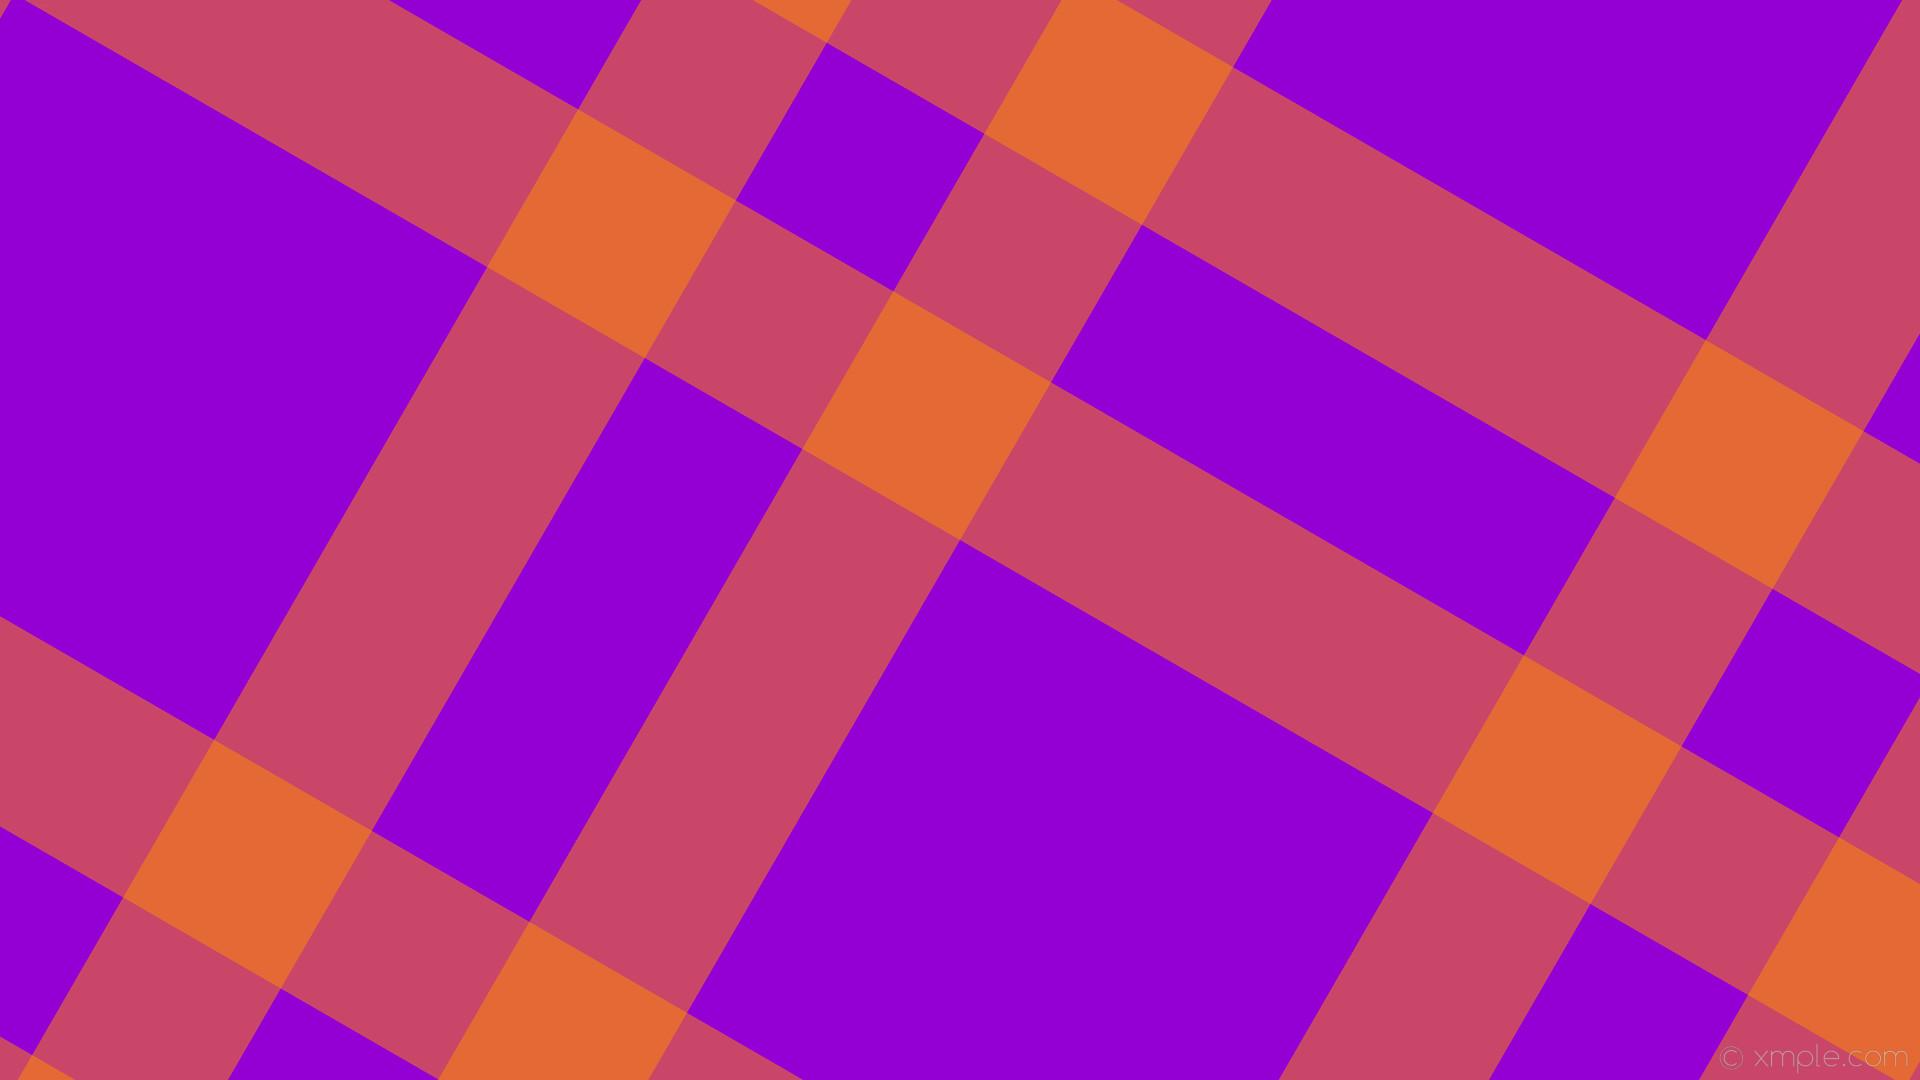 wallpaper dual orange striped gingham purple dark violet dark orange  #9400d3 #ff8c00 150°